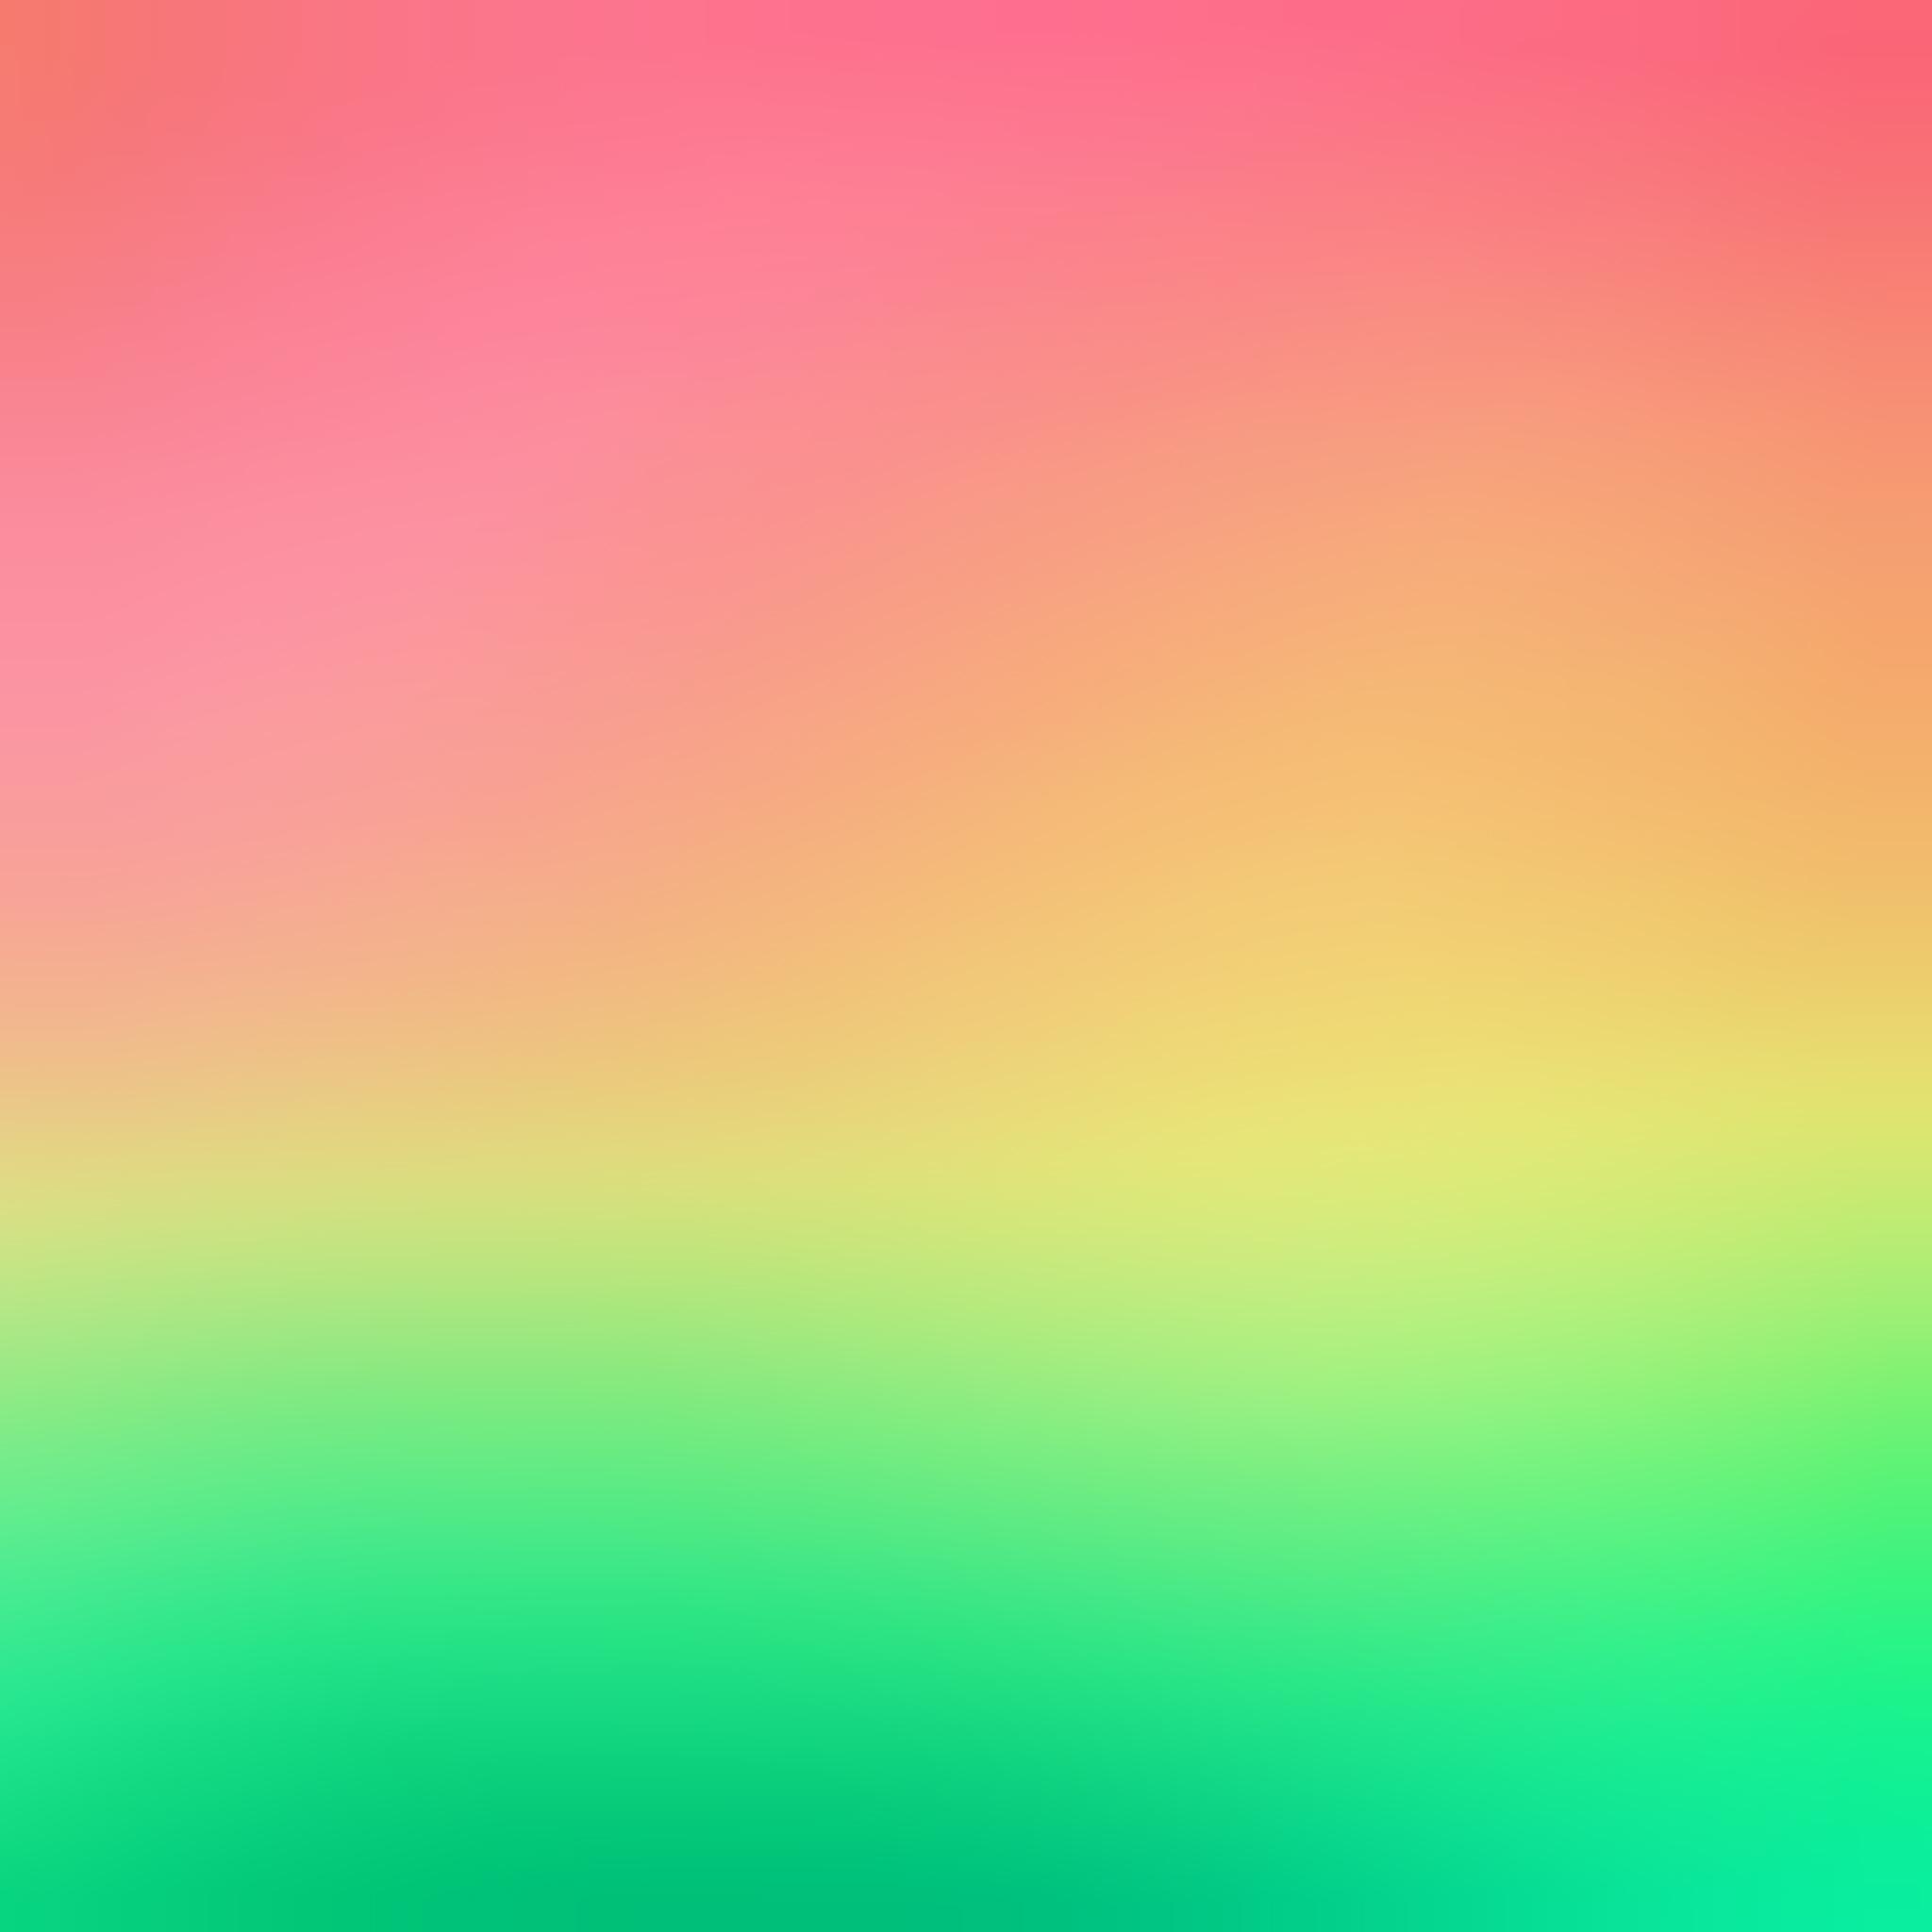 IPad Air Wallpaper Colorful Background 2048x2048Px Ios 7 Hd Wallpaper 2048x2048